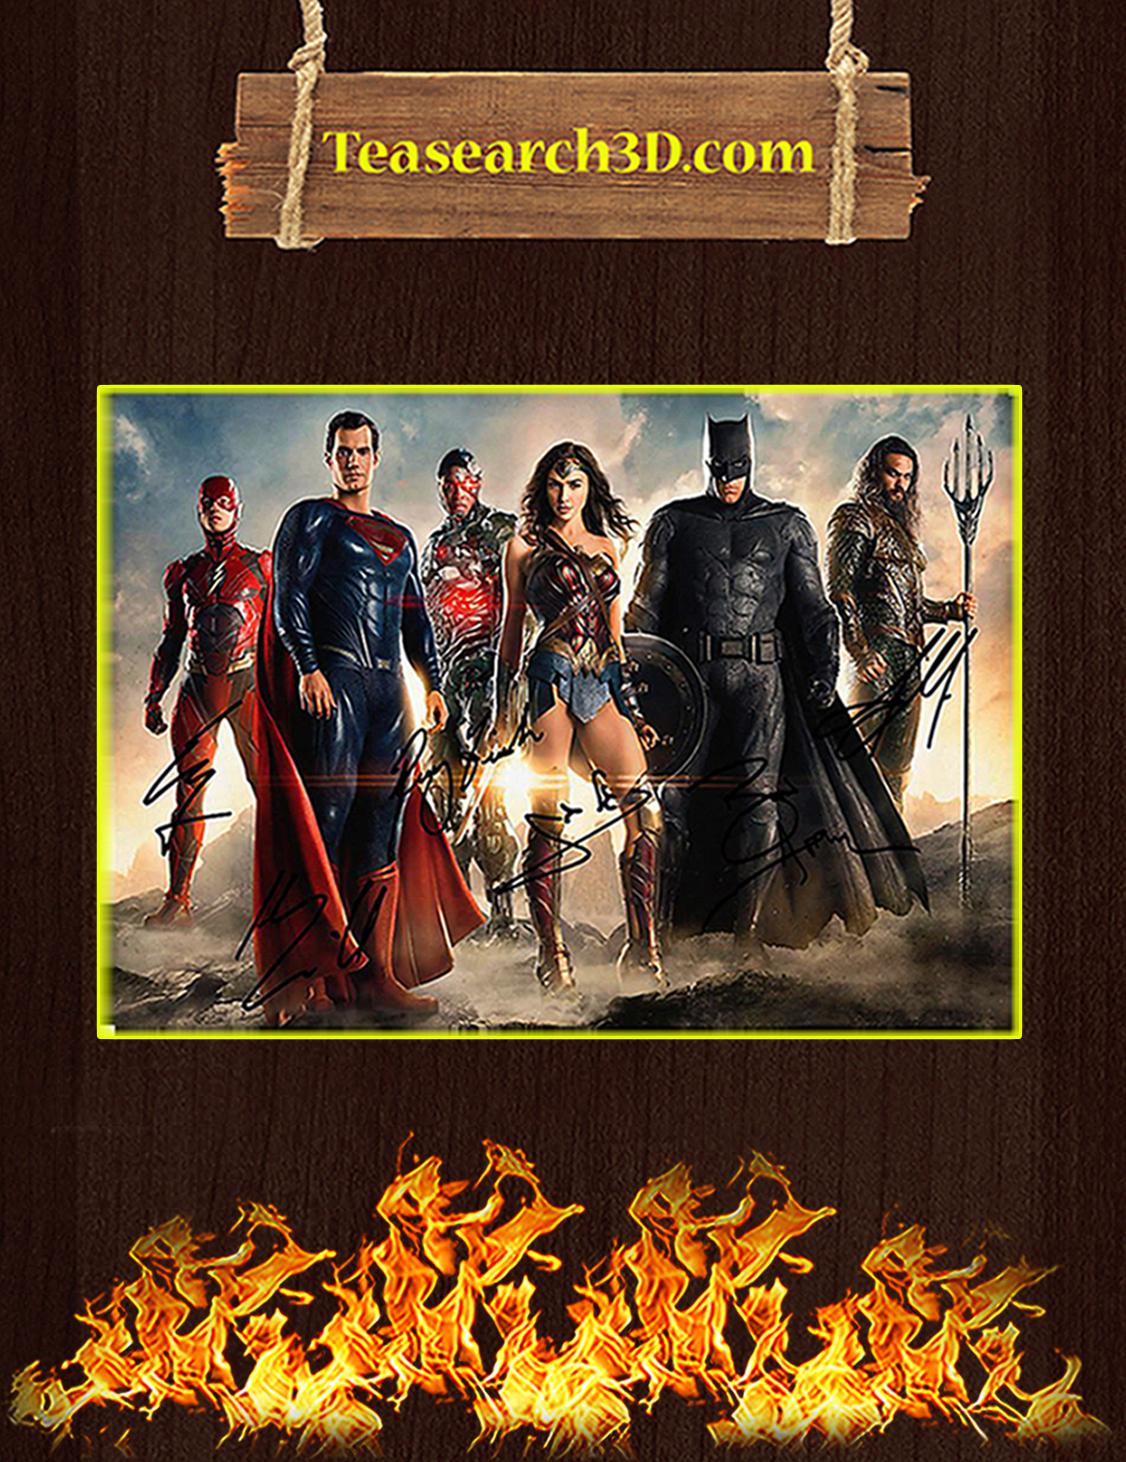 Dc superheroes wonder woman superman batman signature poster A3